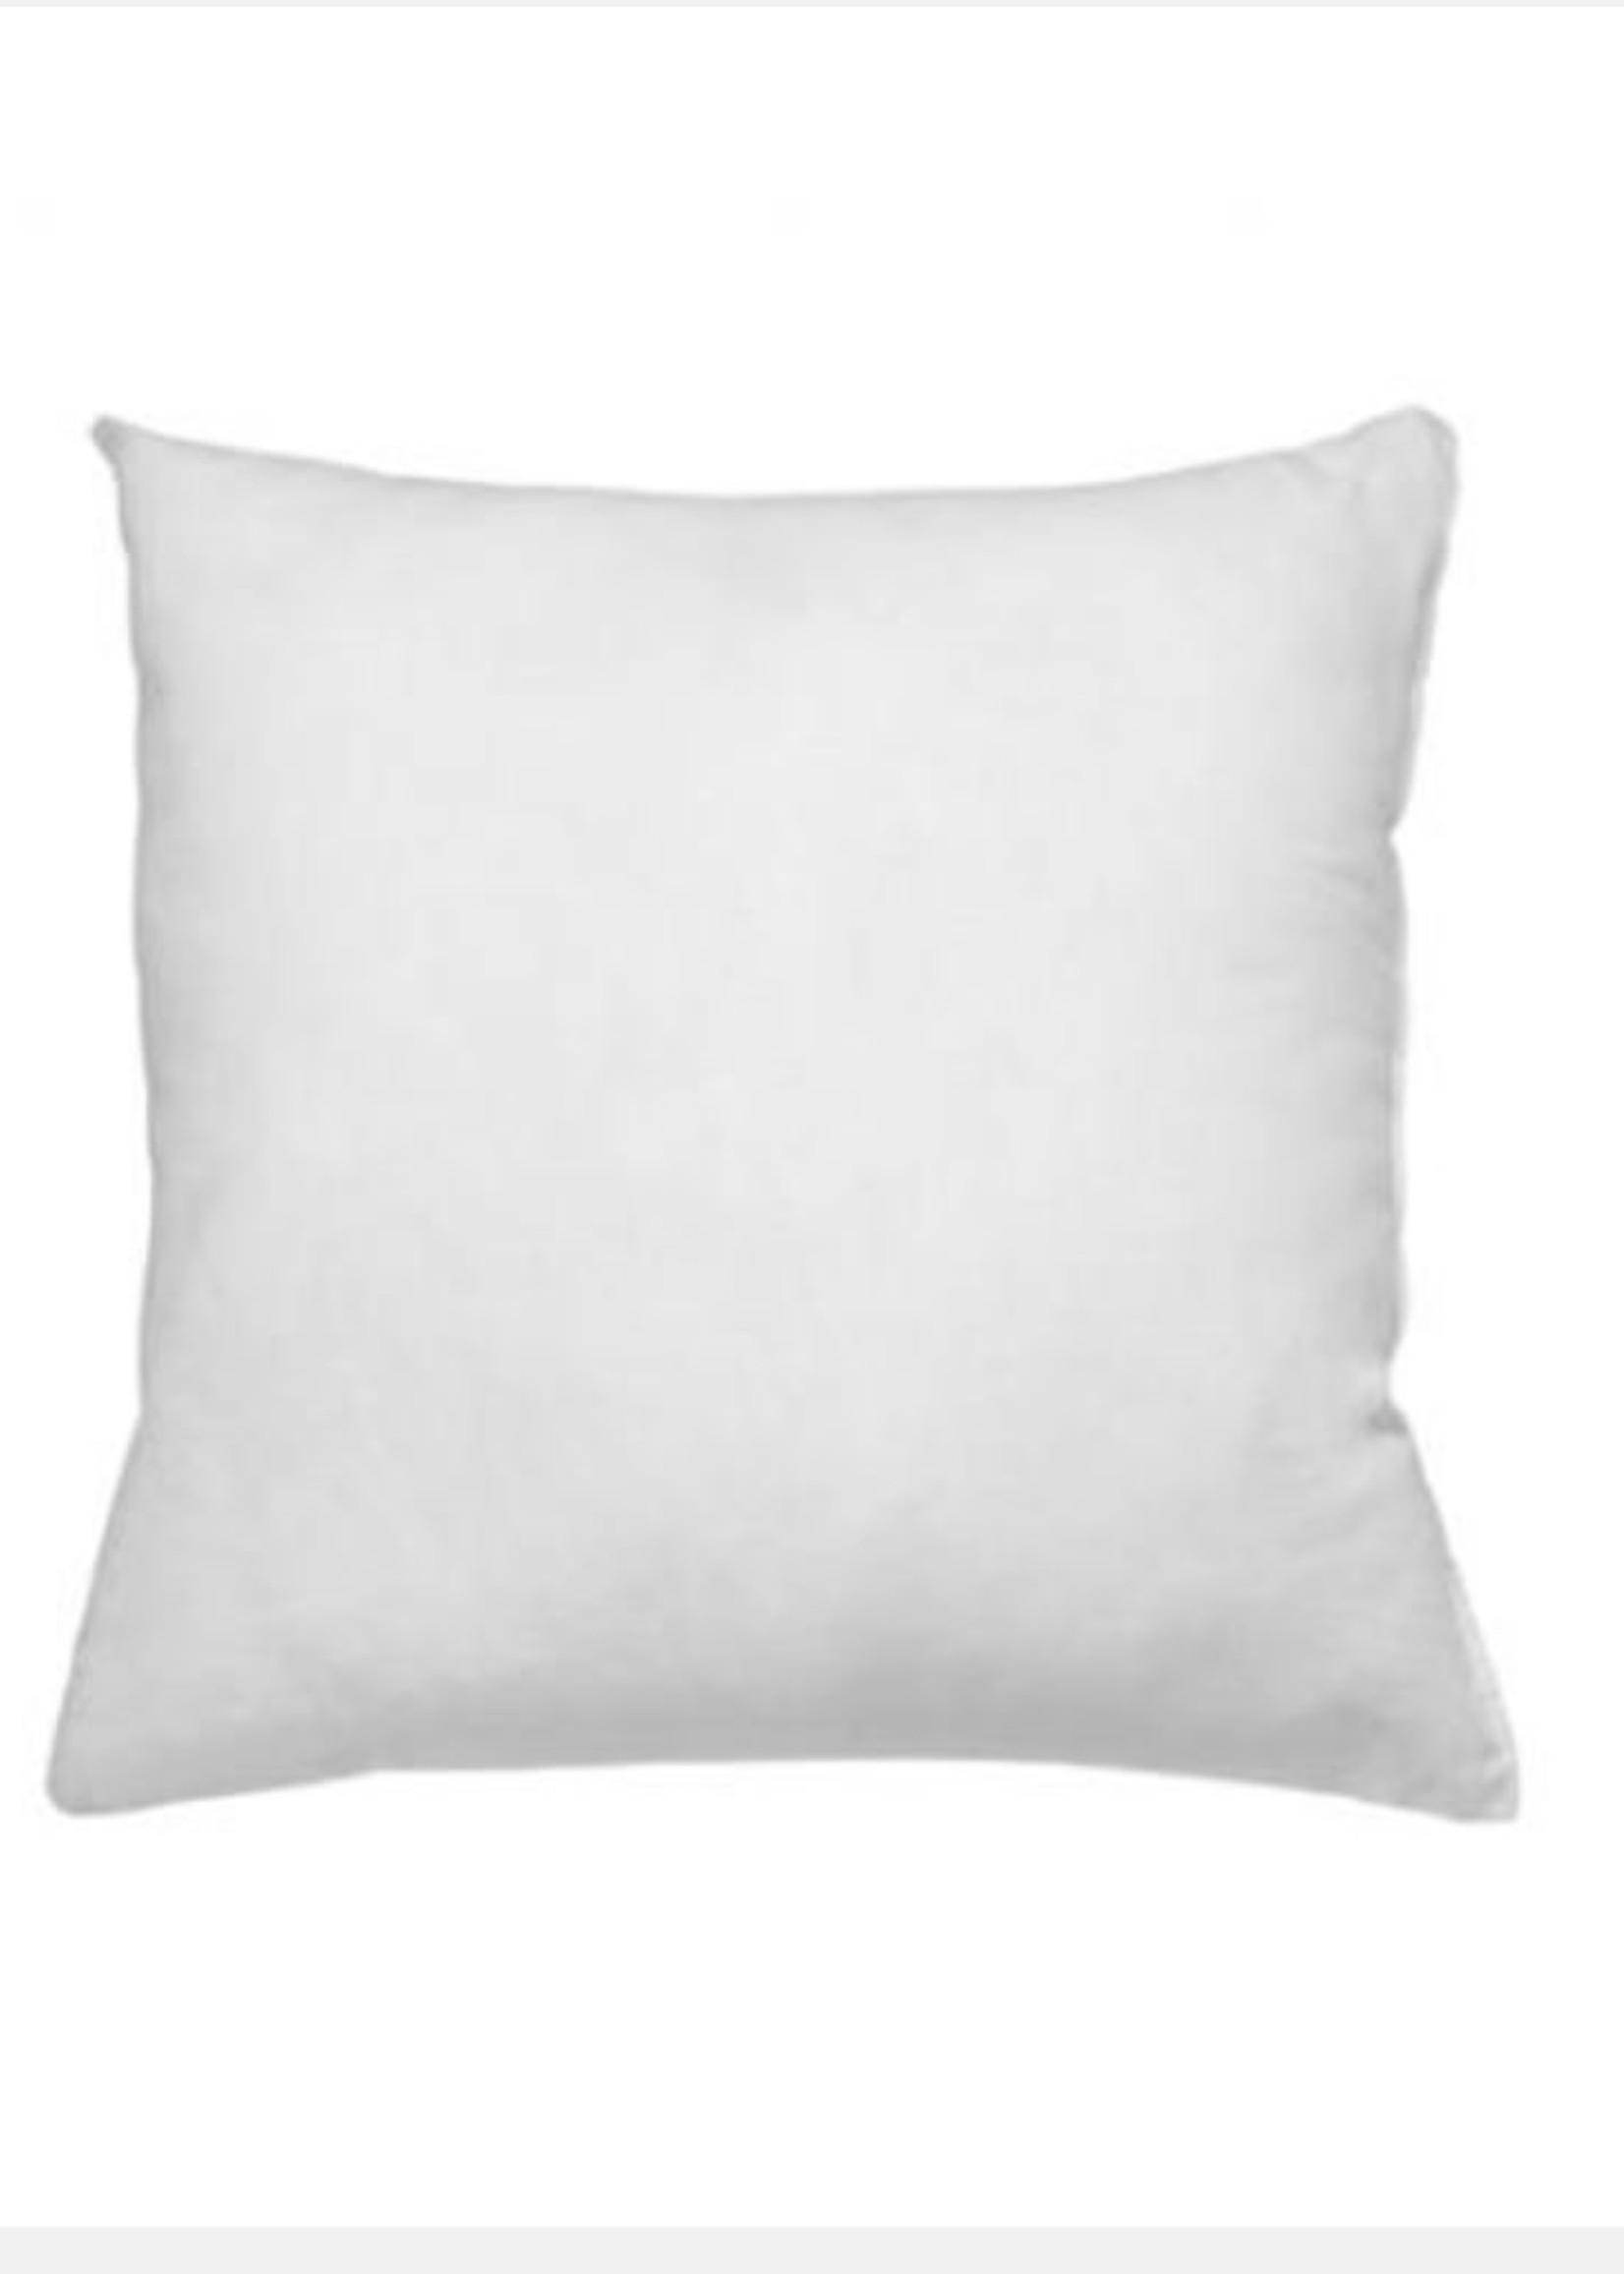 Guts & Goats White Inner Cushion Square 40x40